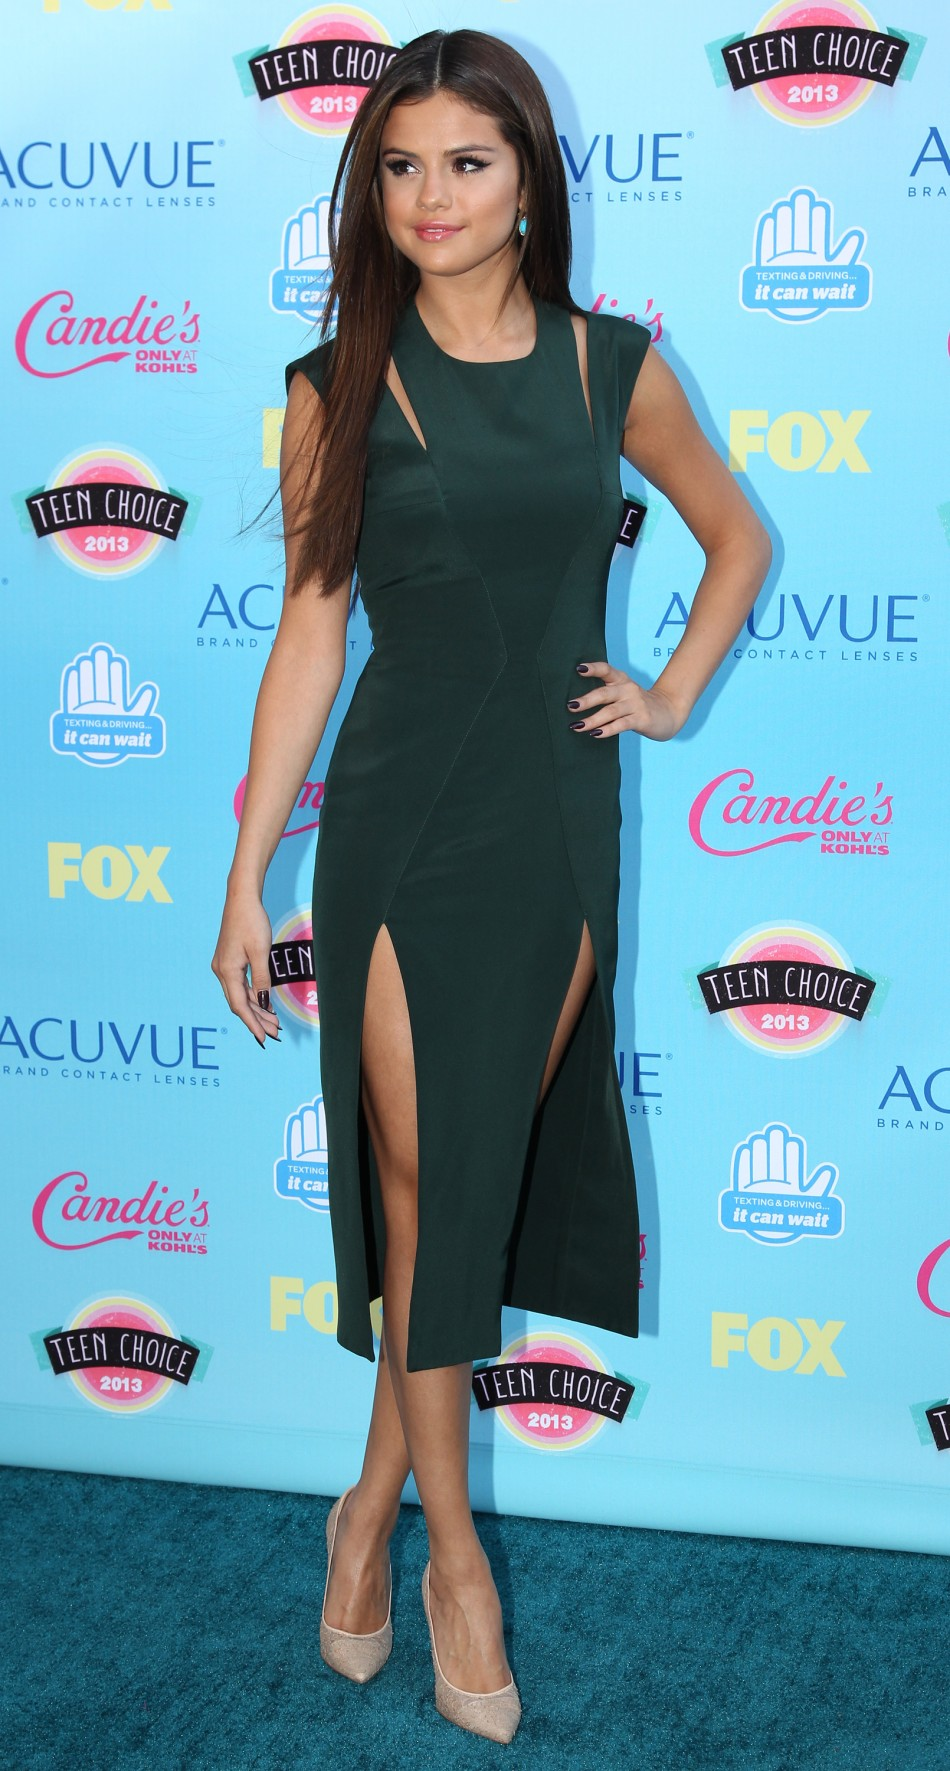 Teen Choice Awards 2017: Red Carpet Arrivals Photos m 16